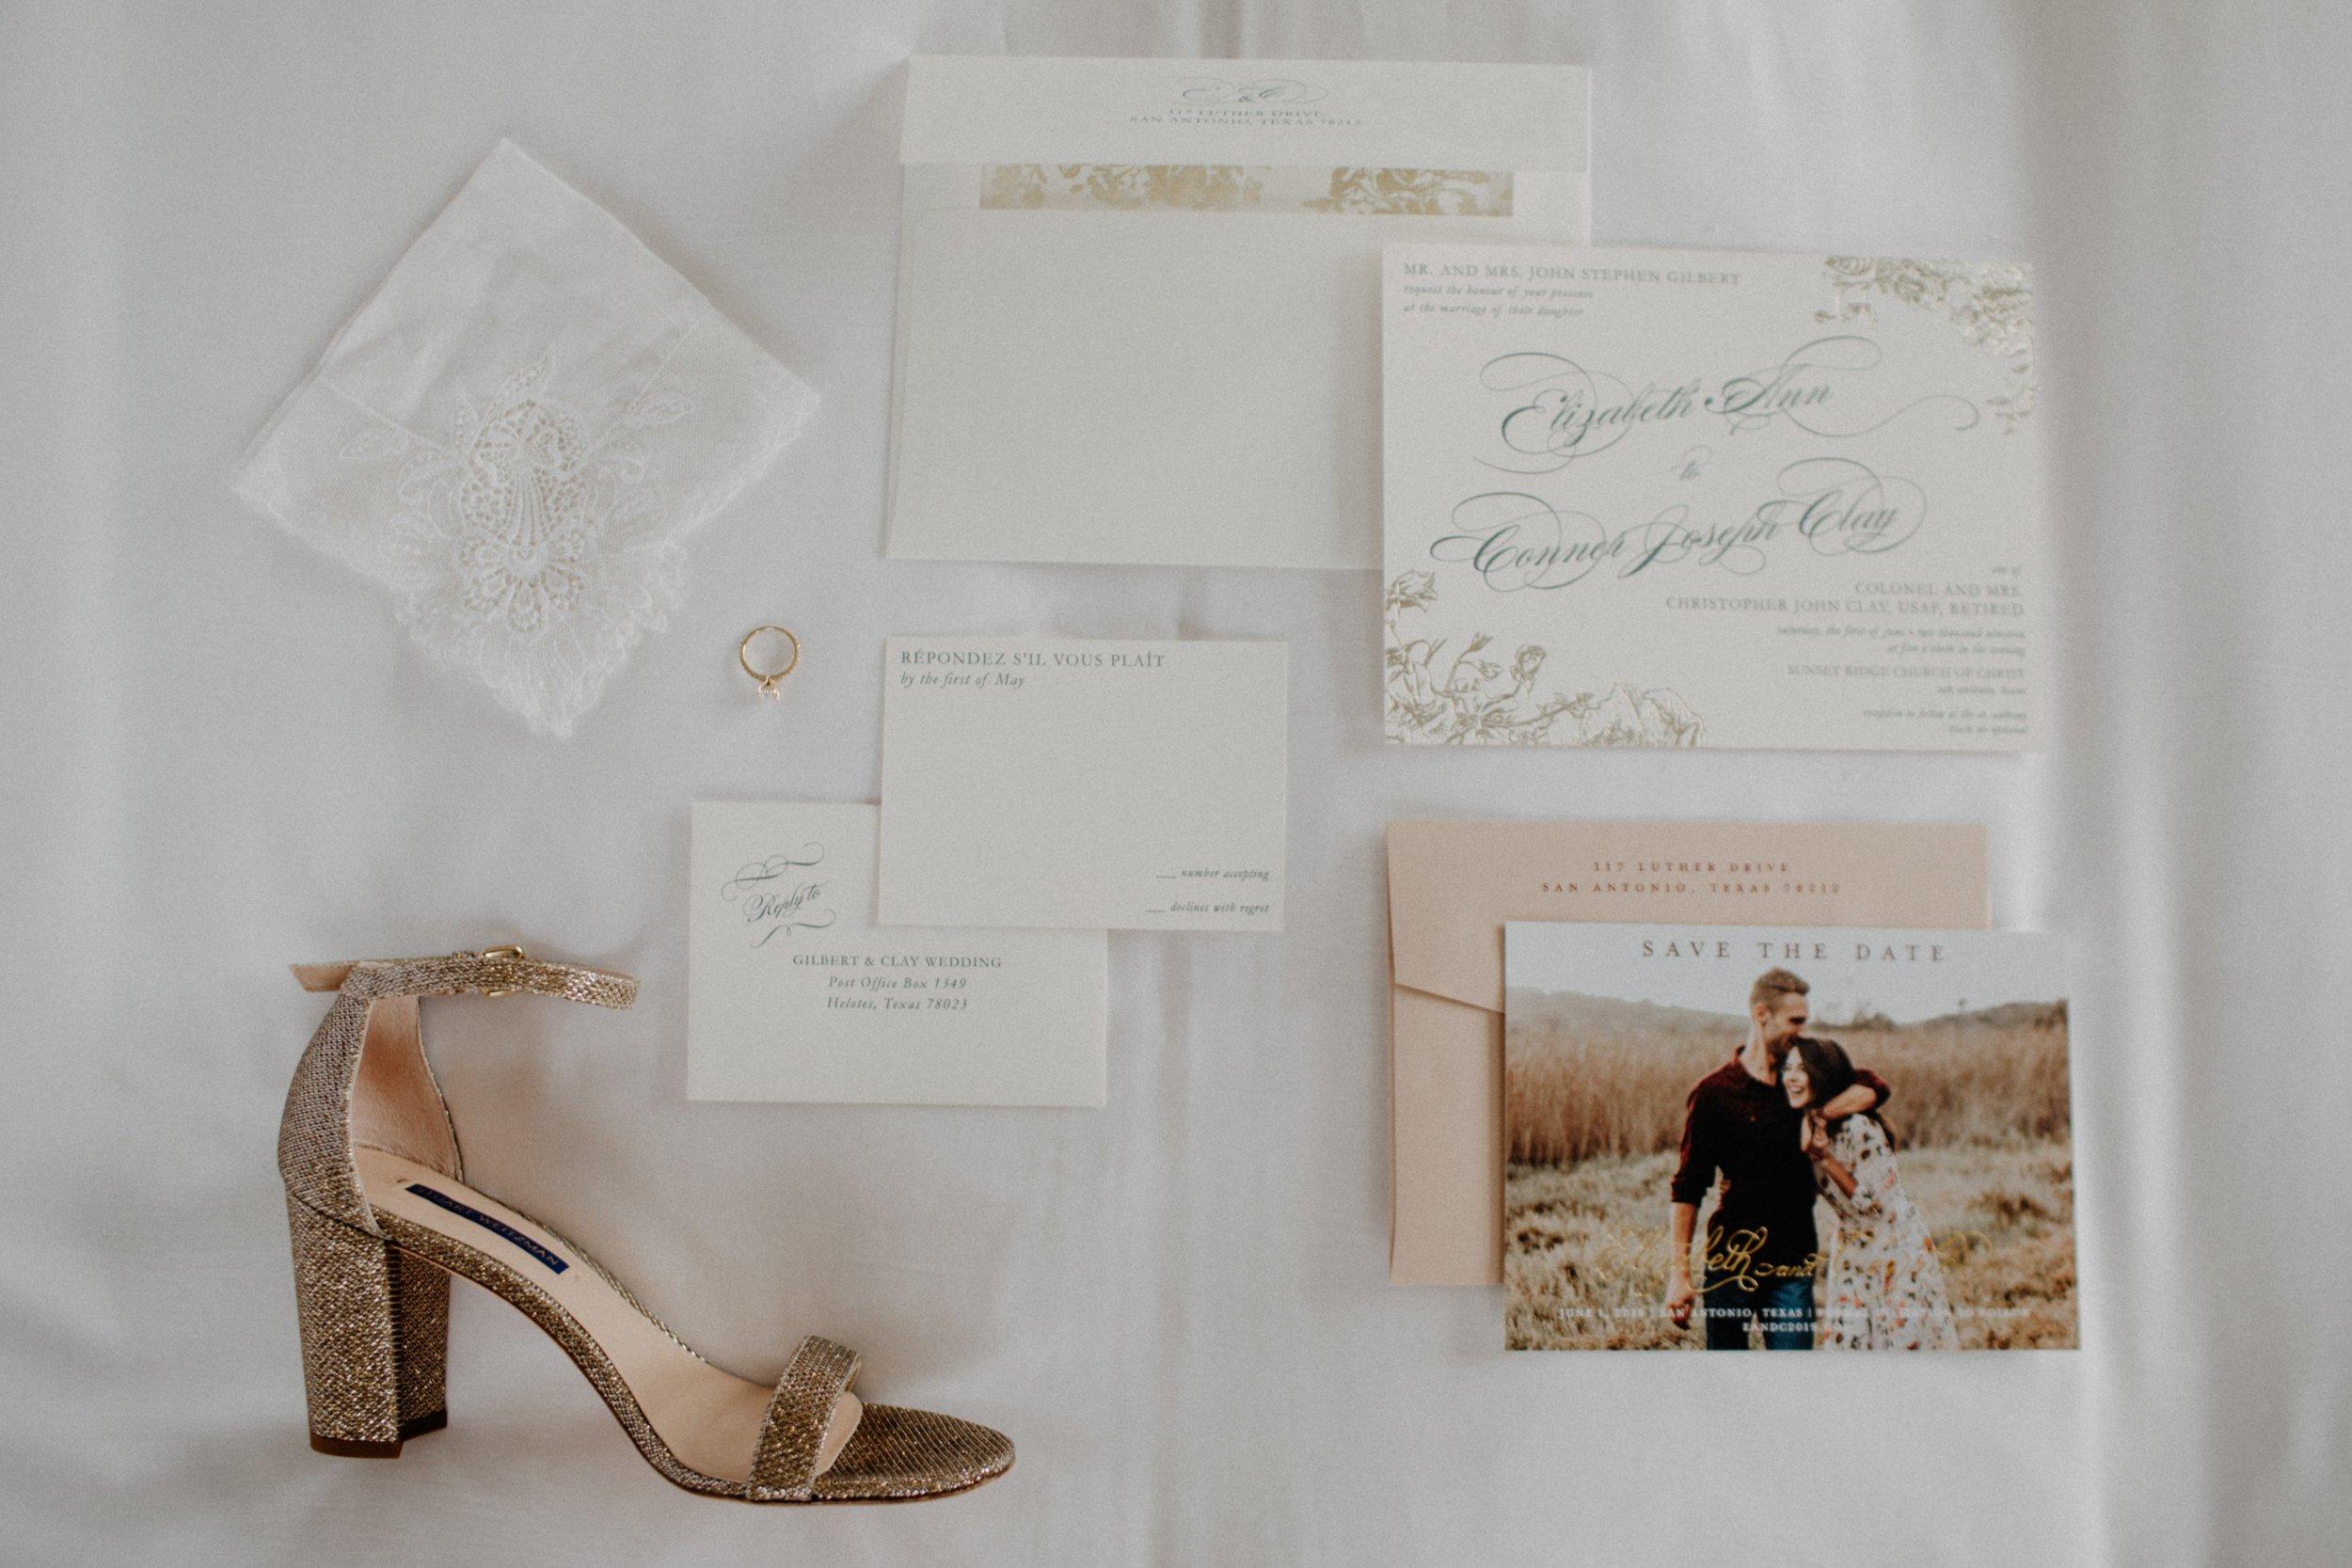 st-anthony-hotel-wedding-photography-10009san-antonio.JPG